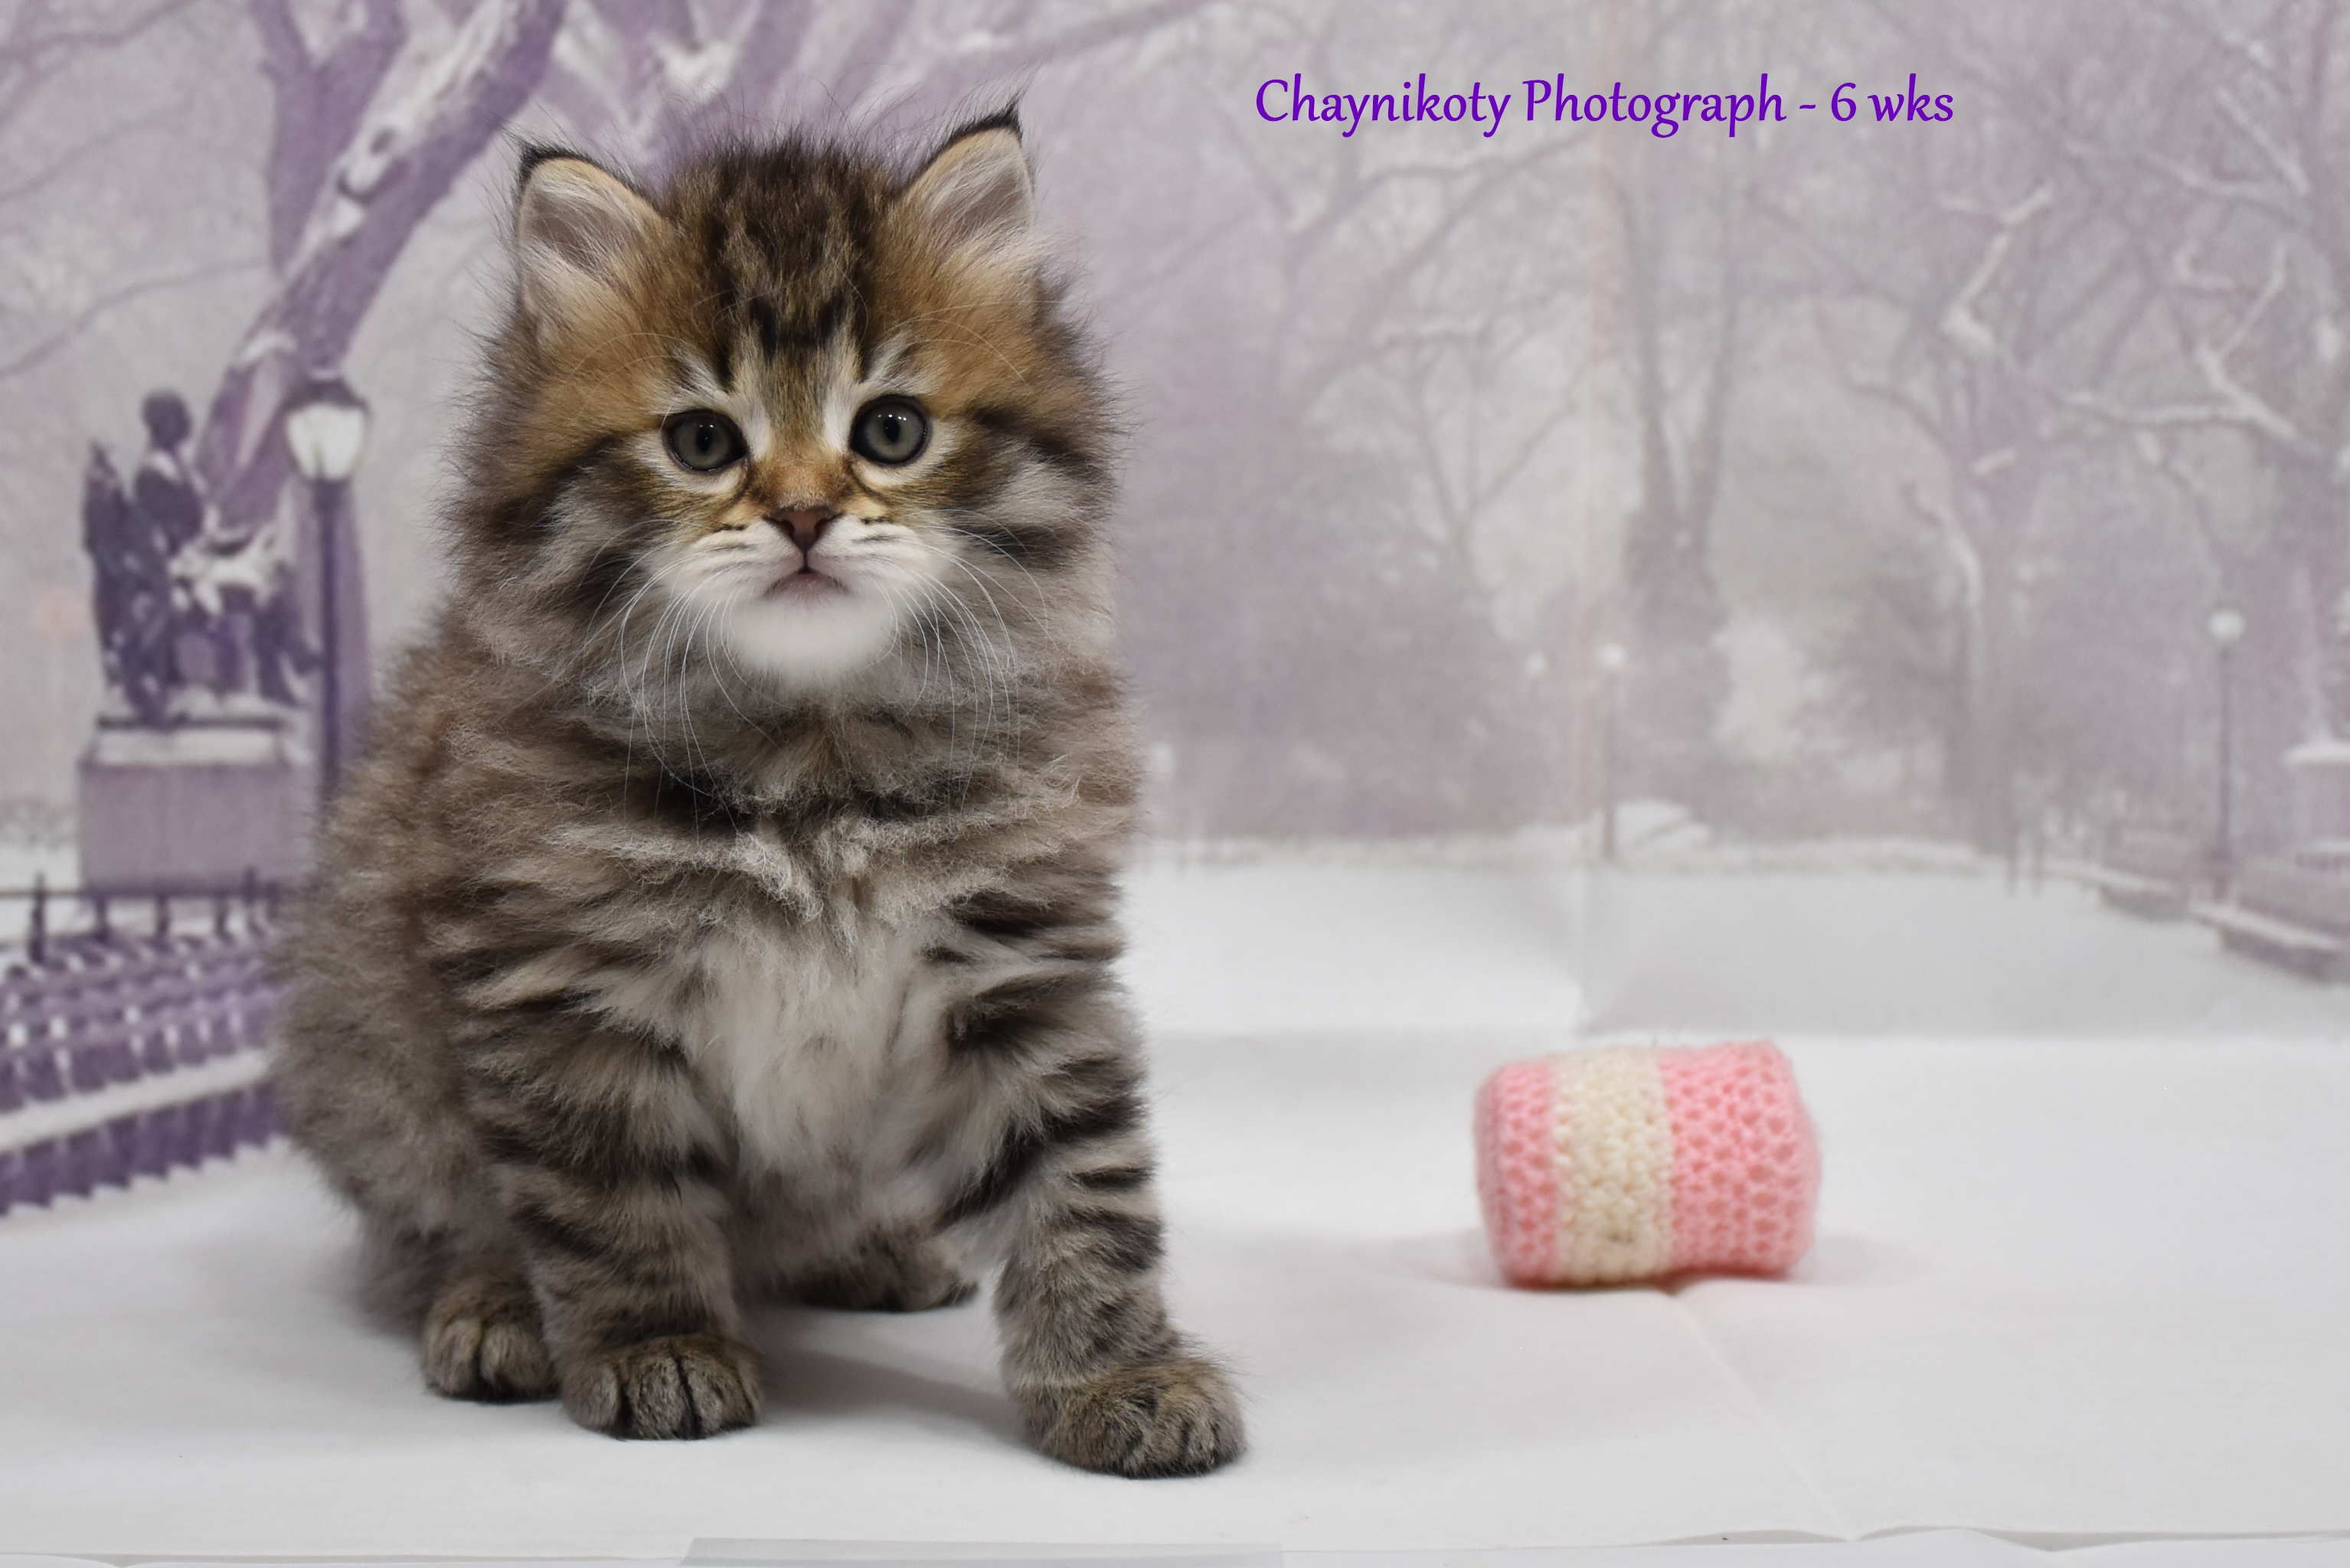 Chaynikoty Photograph